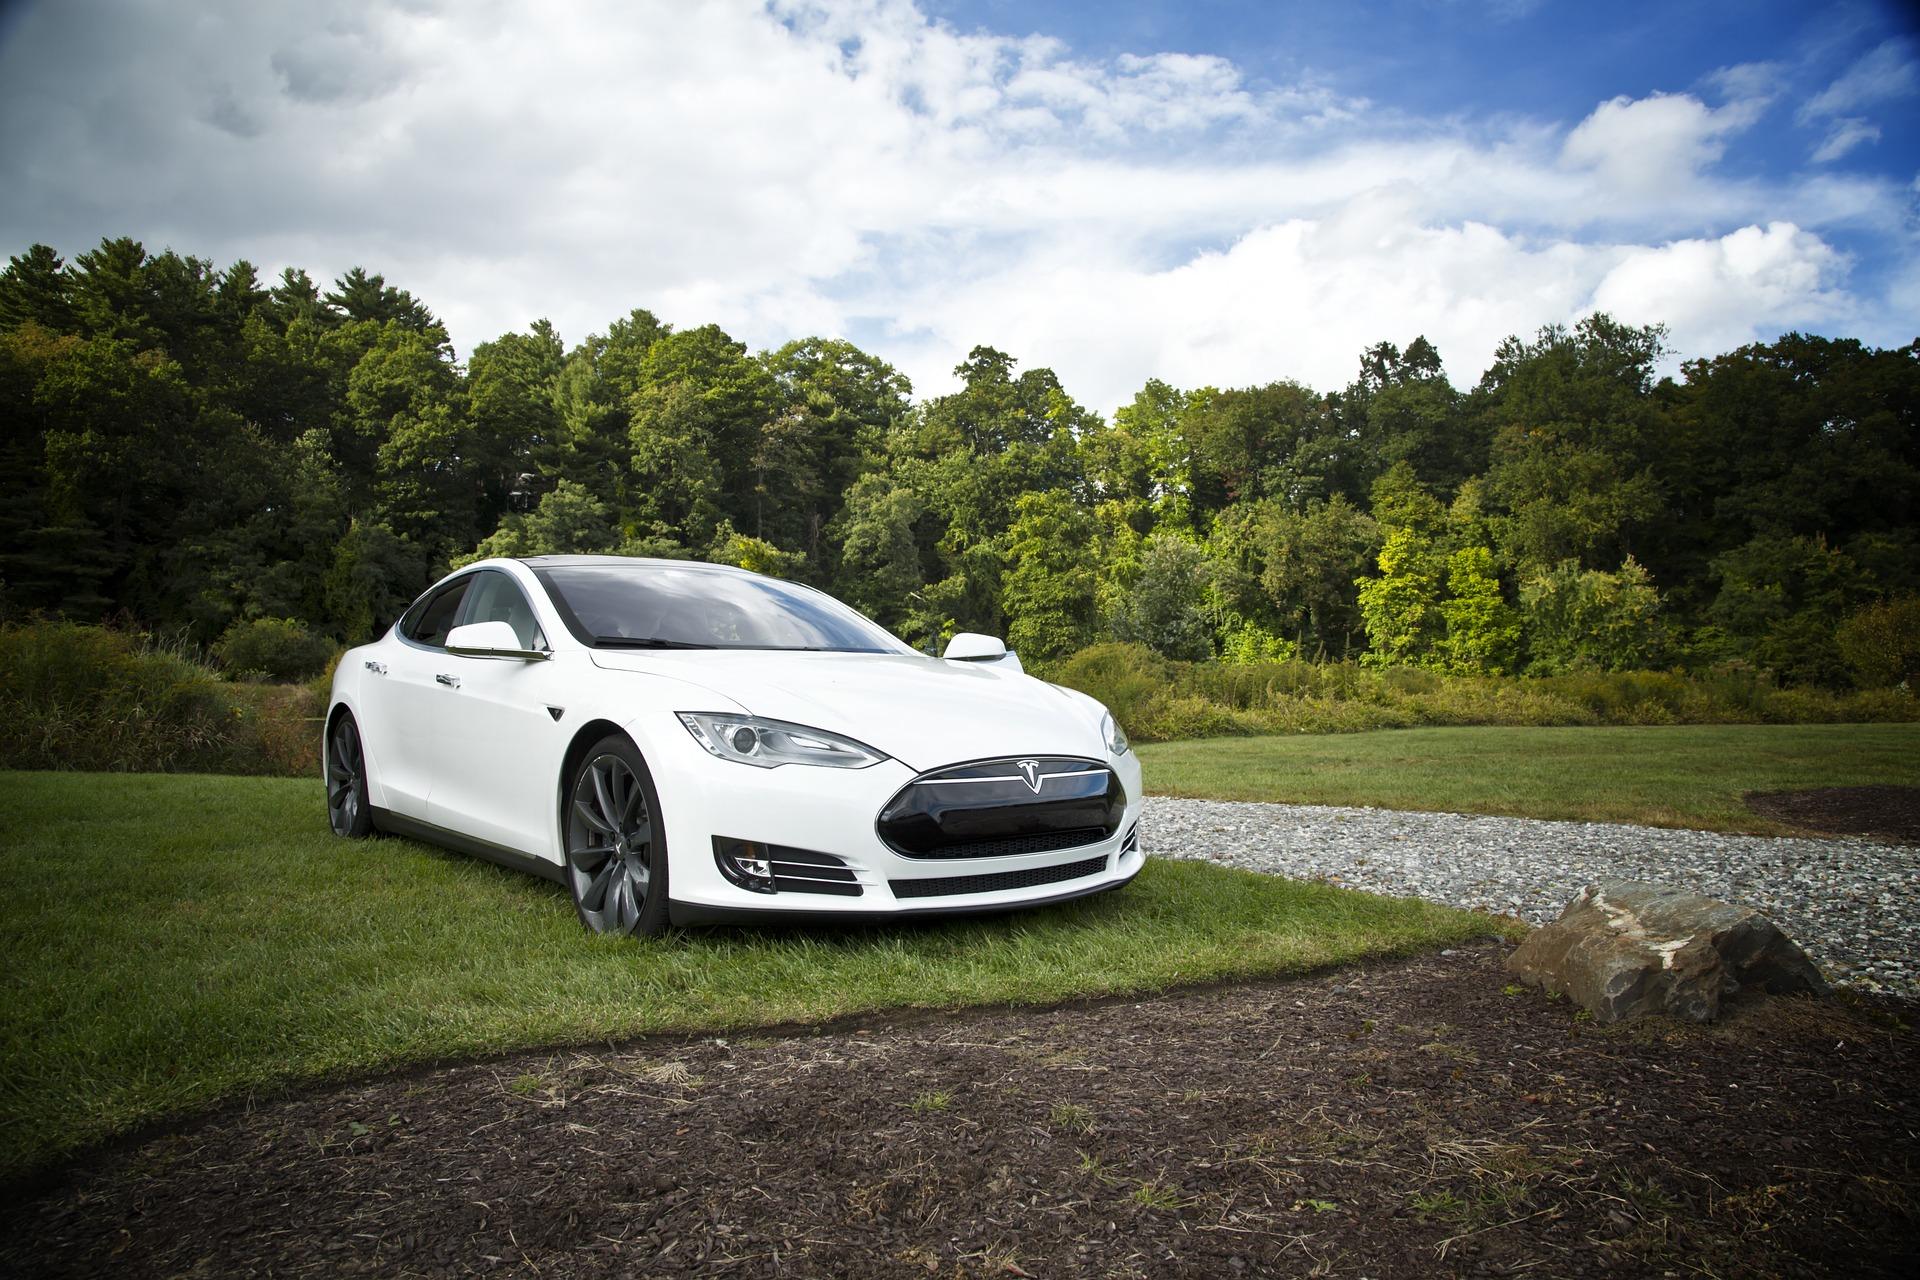 Tesla peretne kontynent — ambitnyj plan Maska